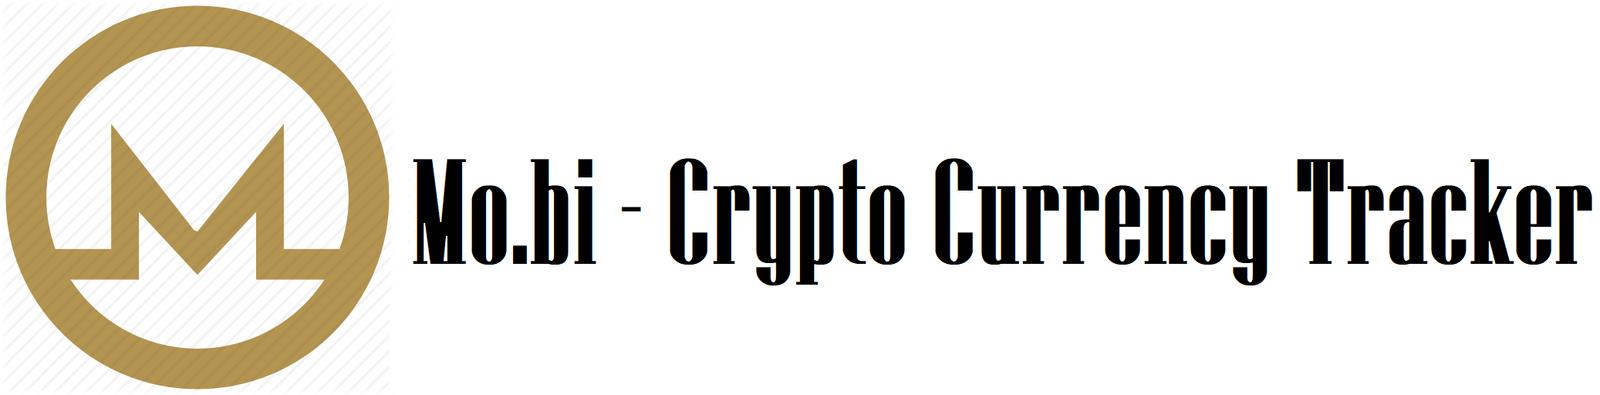 Mo.bi - Crypto Currency Tracker logo